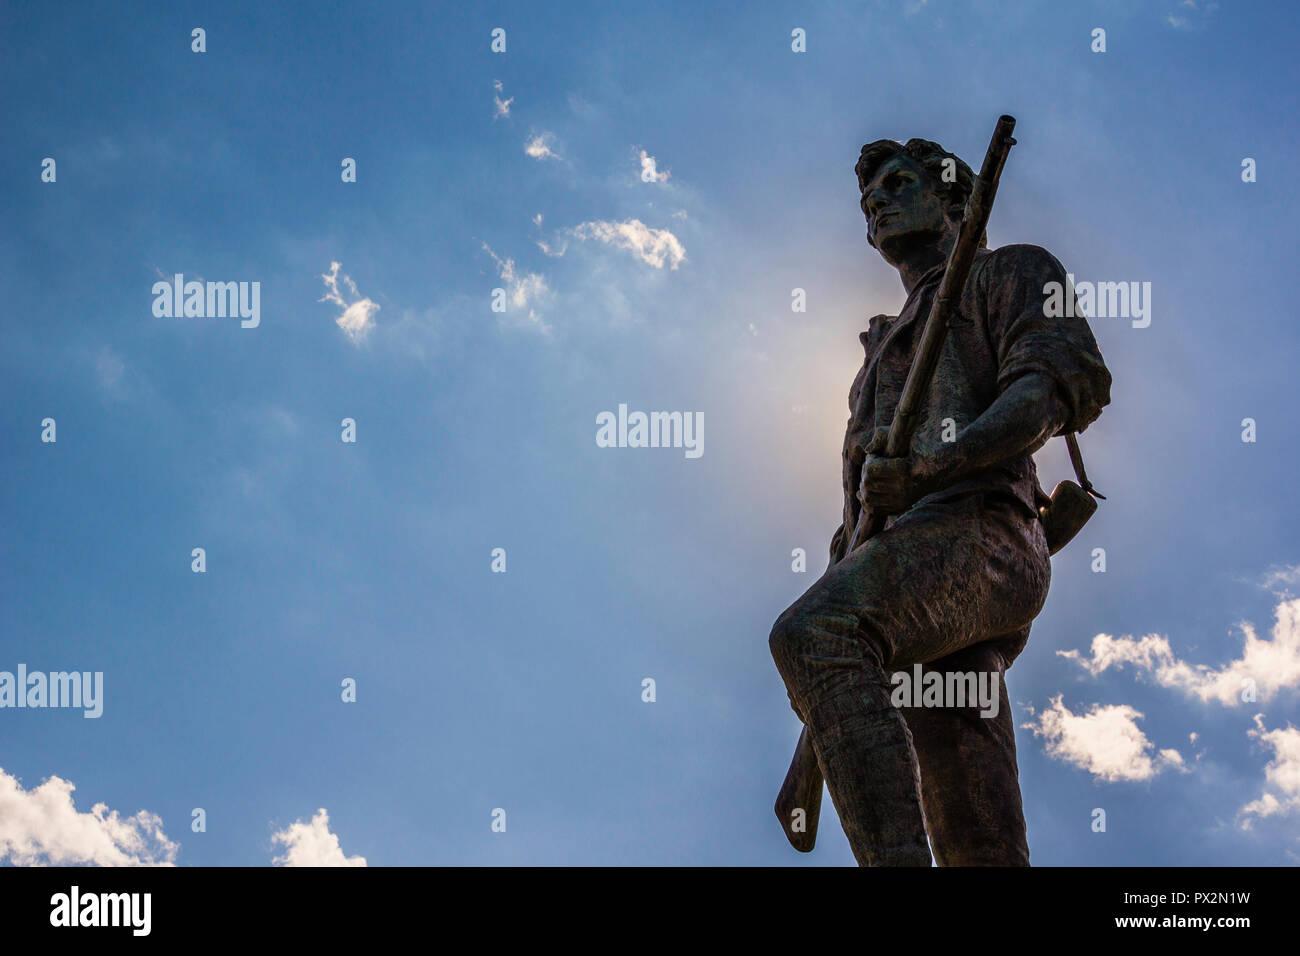 Minuteman Statue Lexington Battle Green _ Lexington, Massachusetts, USA Stock Photo